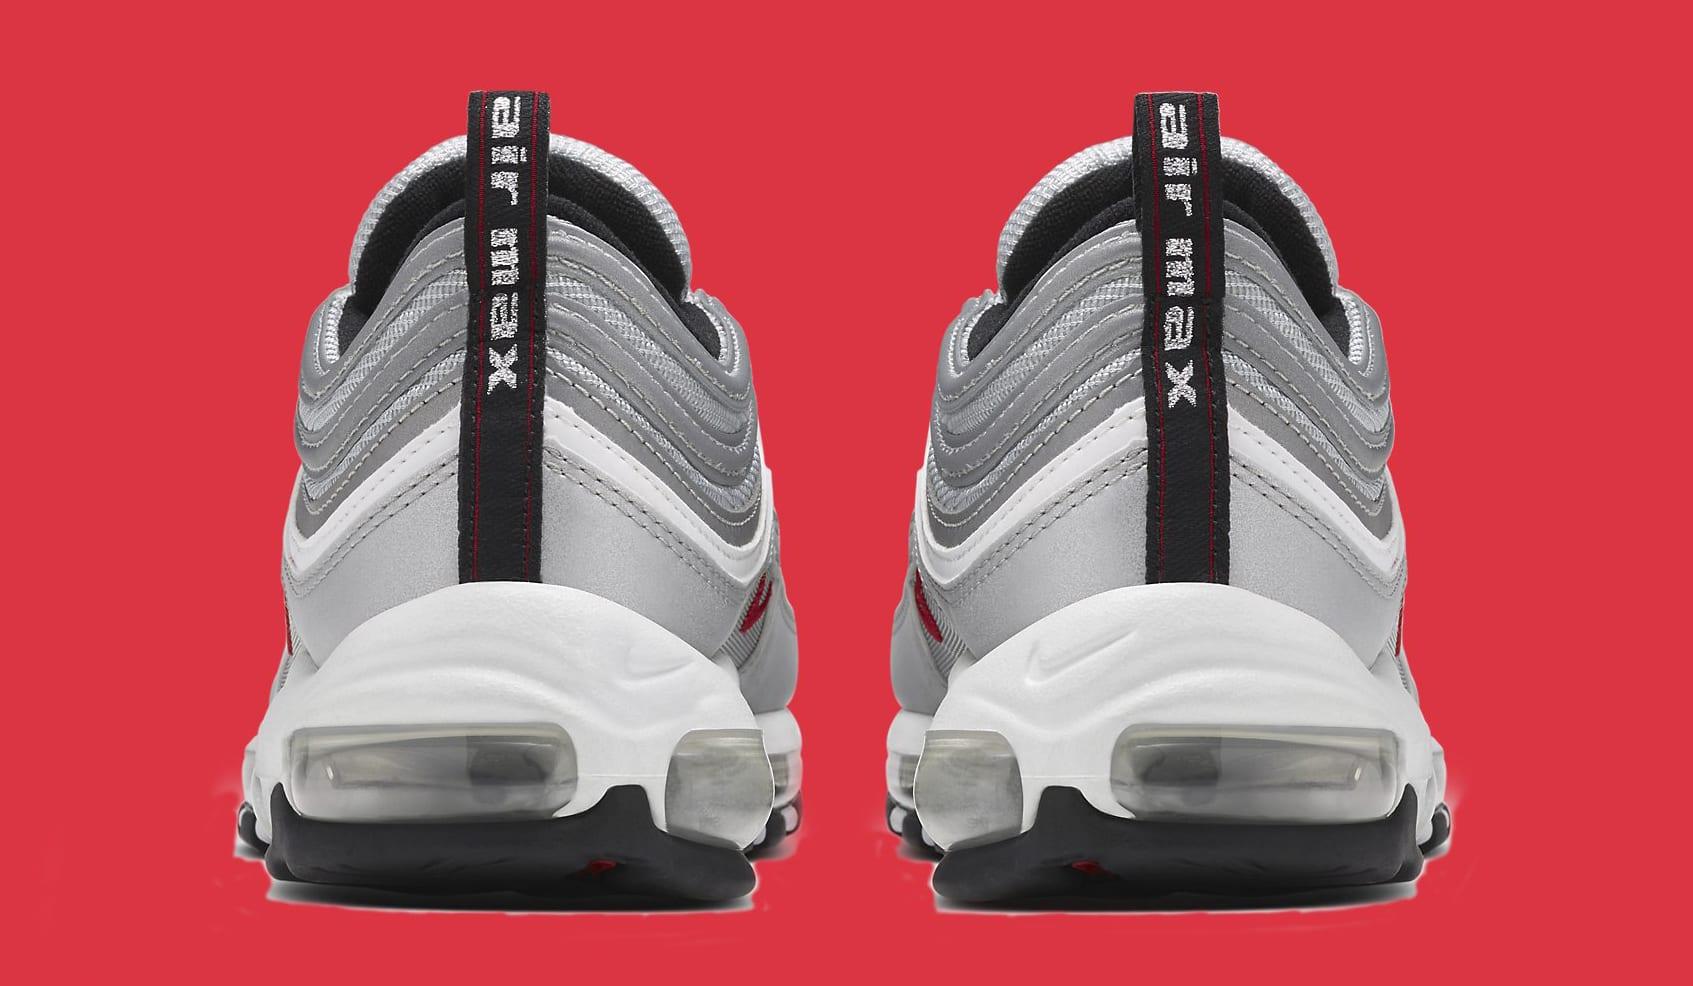 Silver Nike Air Max 97 884421-001 Heel